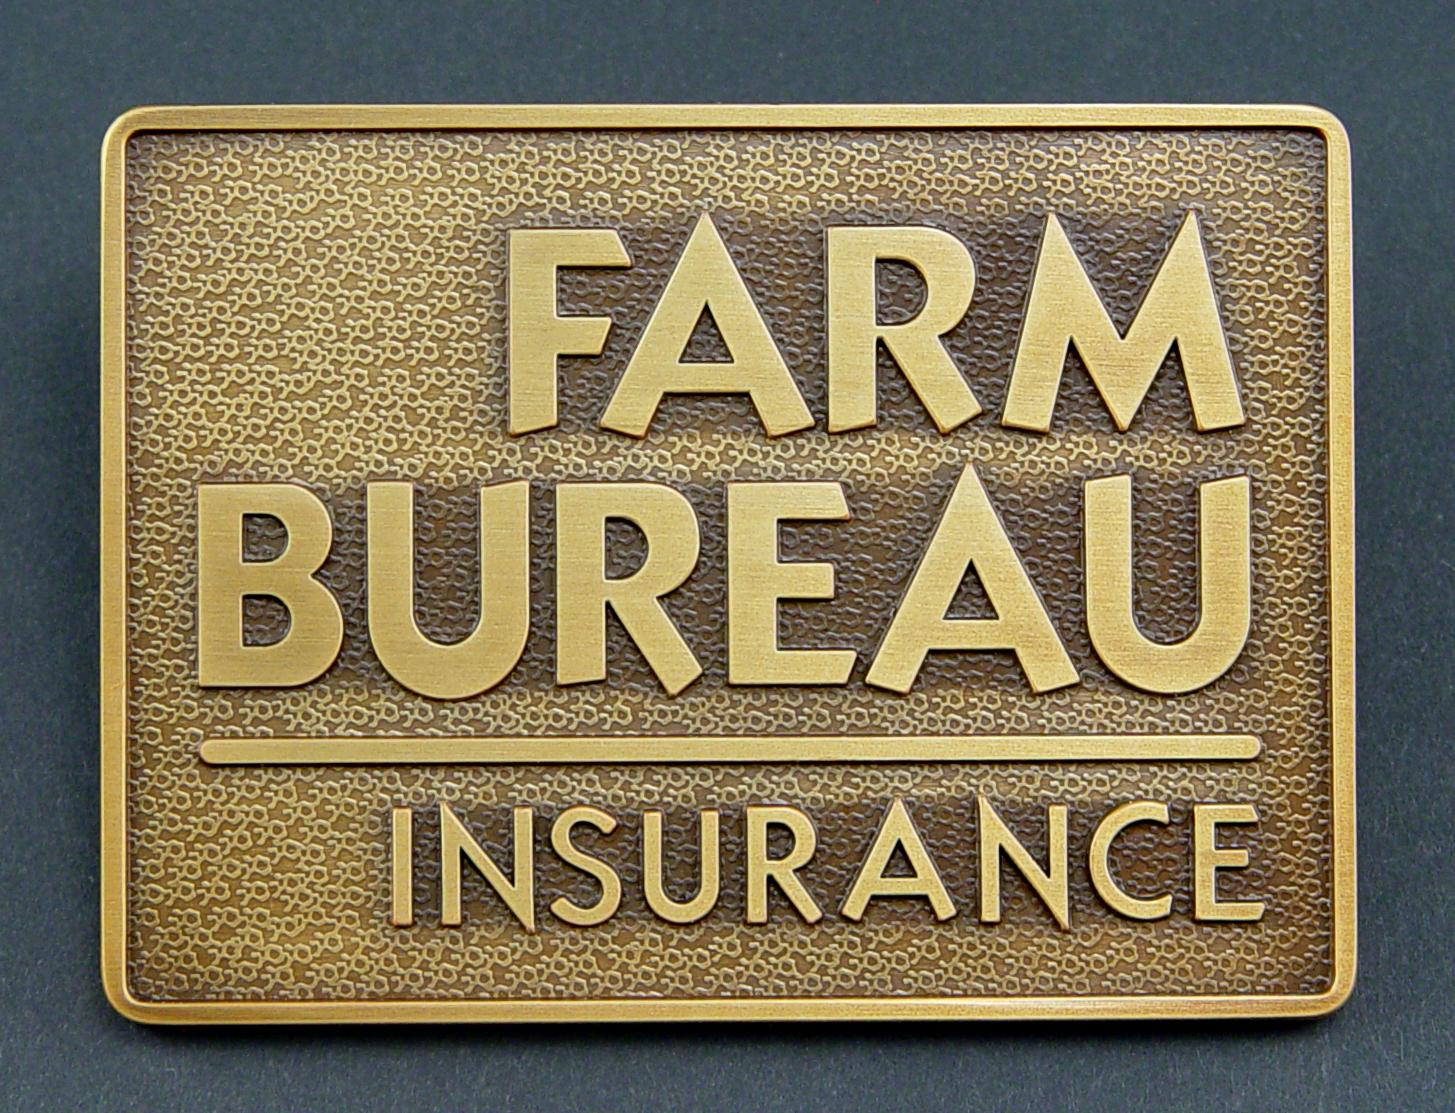 Farm bureau insurance sign bruce fox custom signs for Bureau insurance